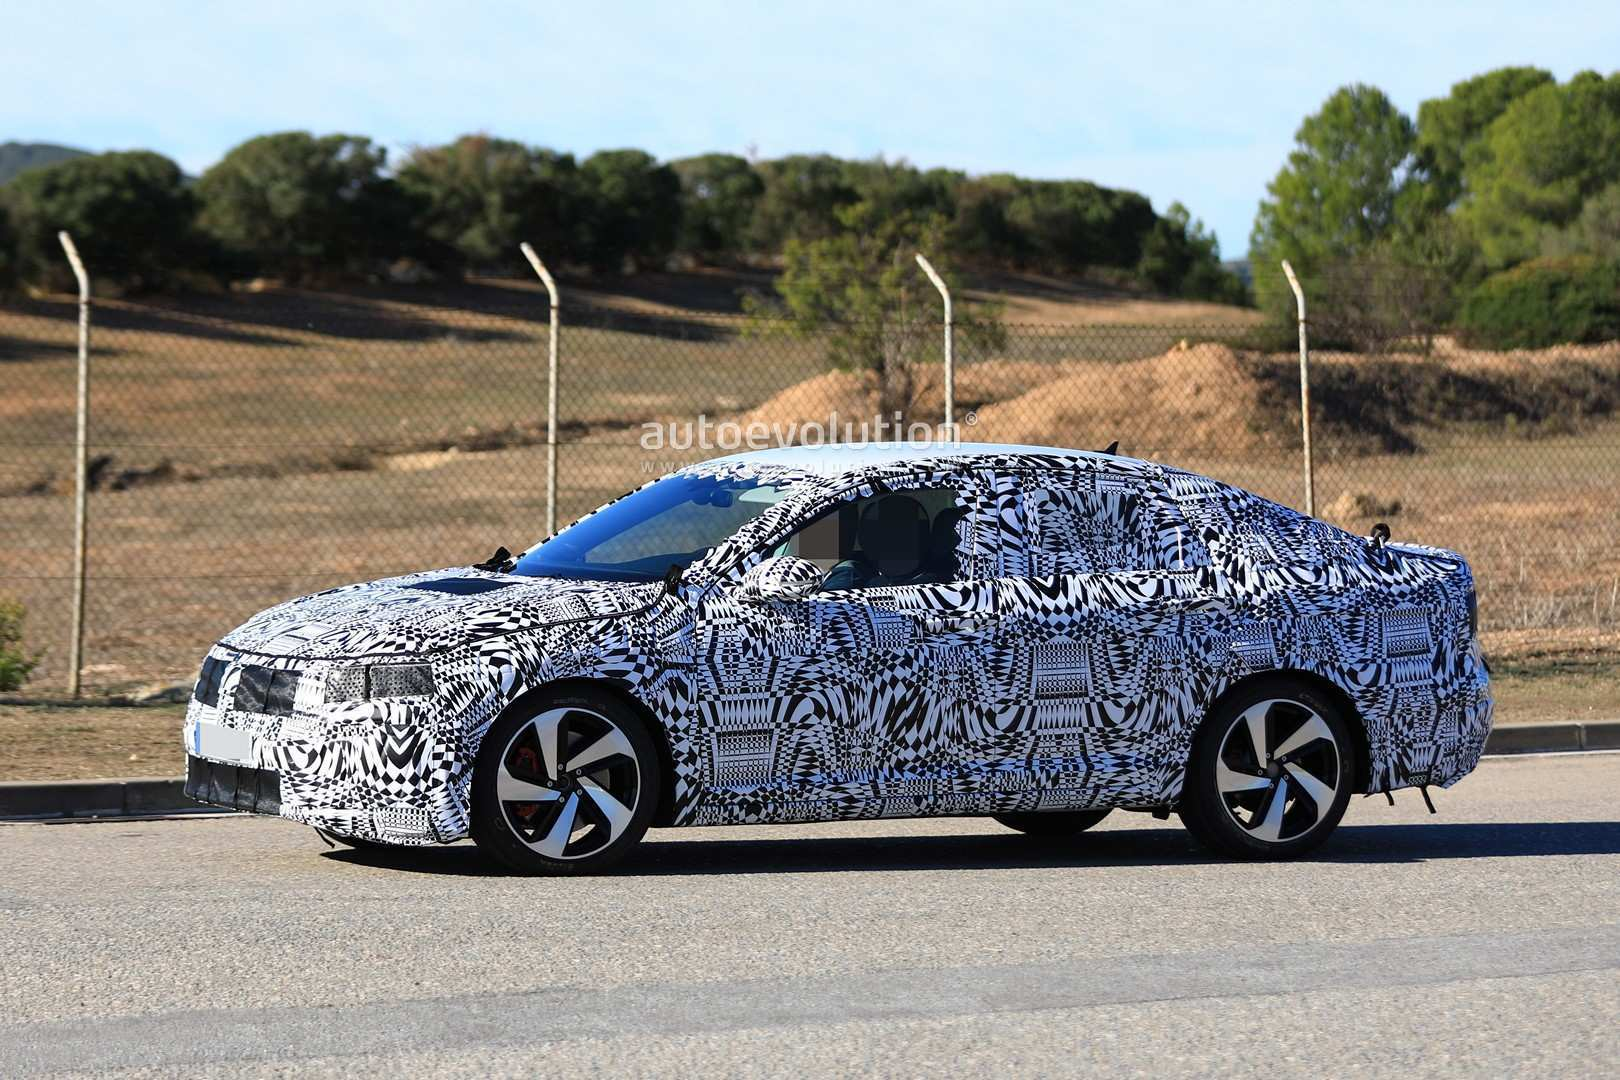 35 Gallery of Volkswagen Jetta 2019 Used Spy Shoot Interior by Volkswagen Jetta 2019 Used Spy Shoot